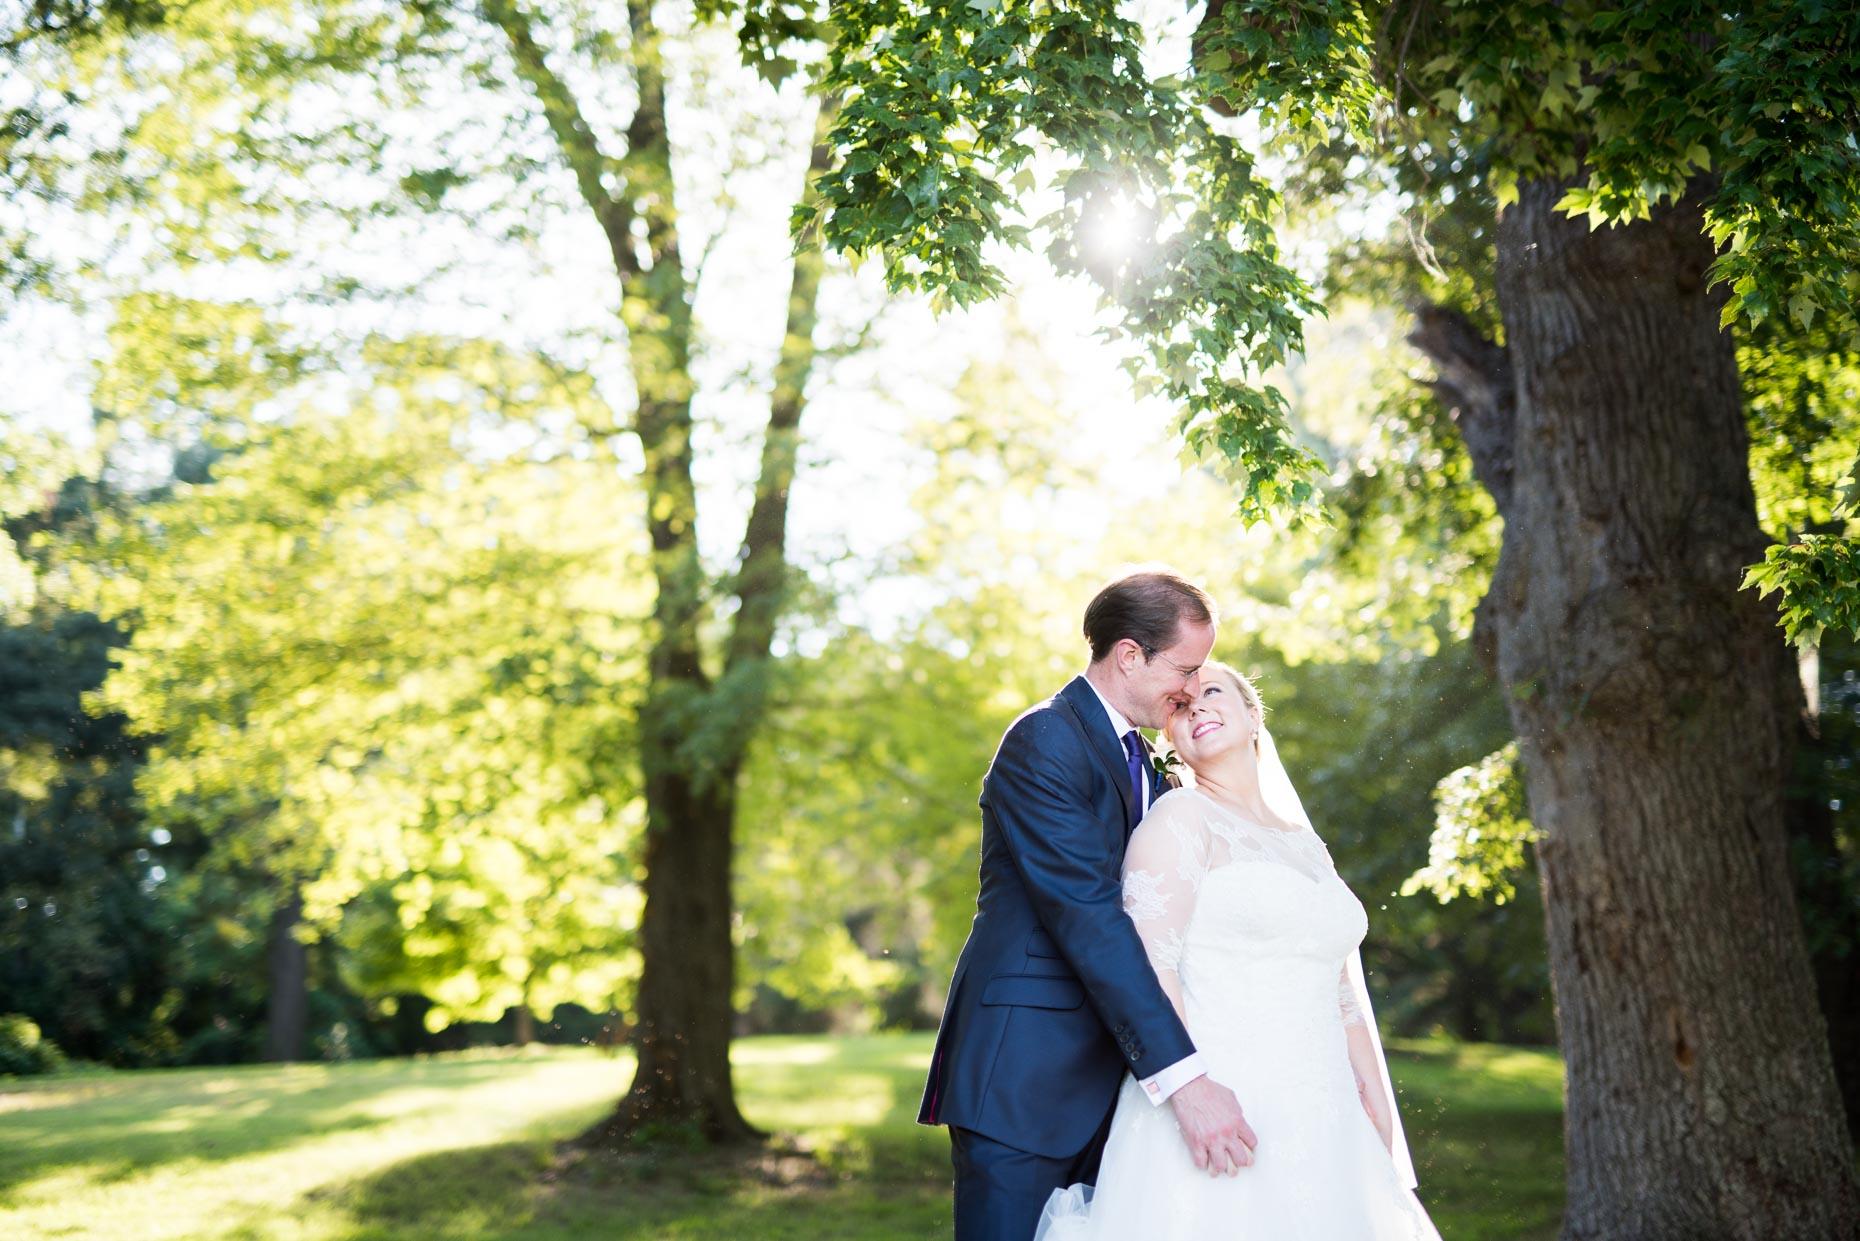 Weddings by Elliott O'Donovan - Washington DC_-7.jpg